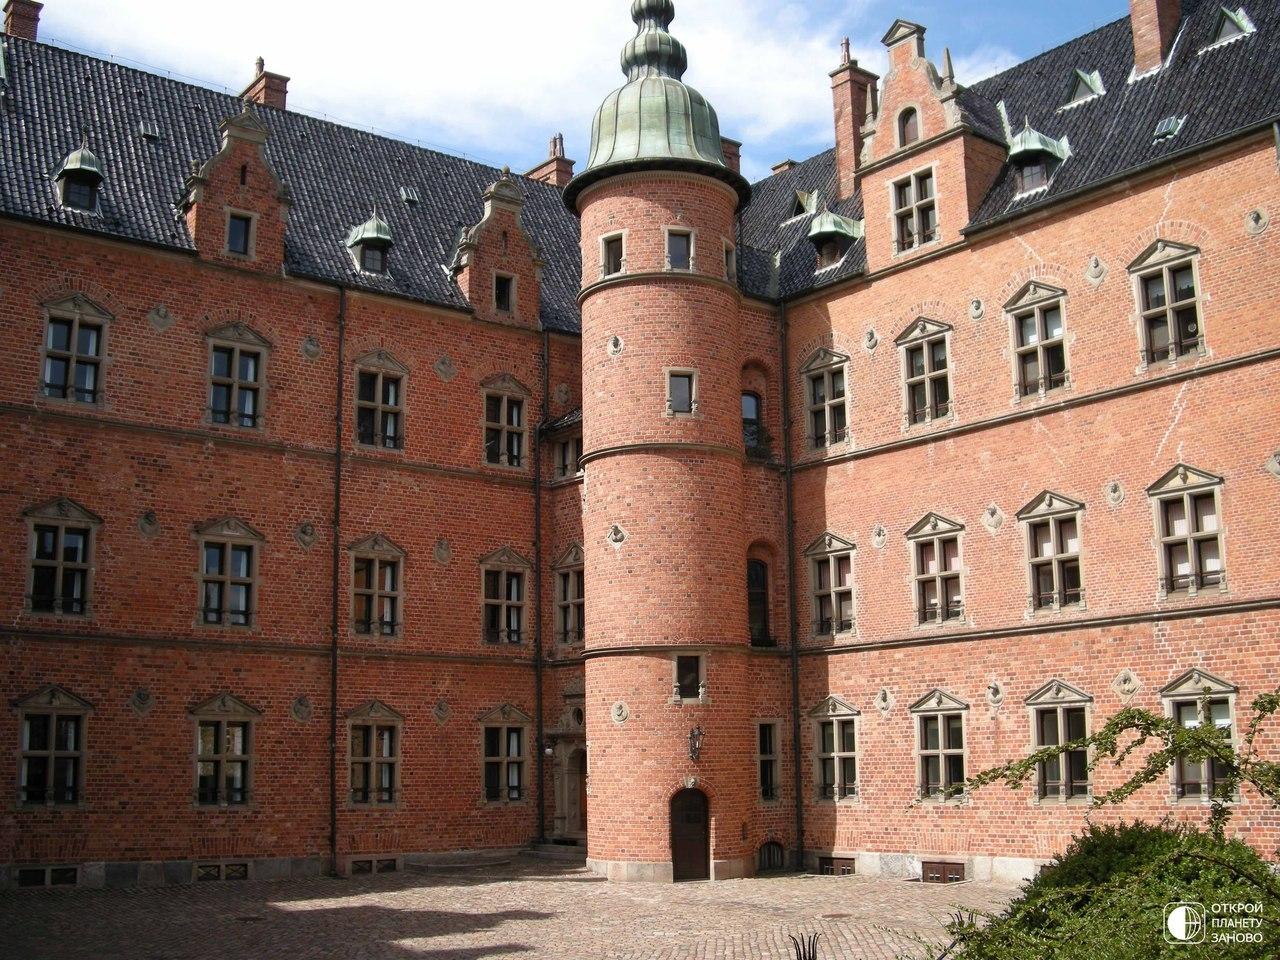 Замок Валлё (Vallo Slot)